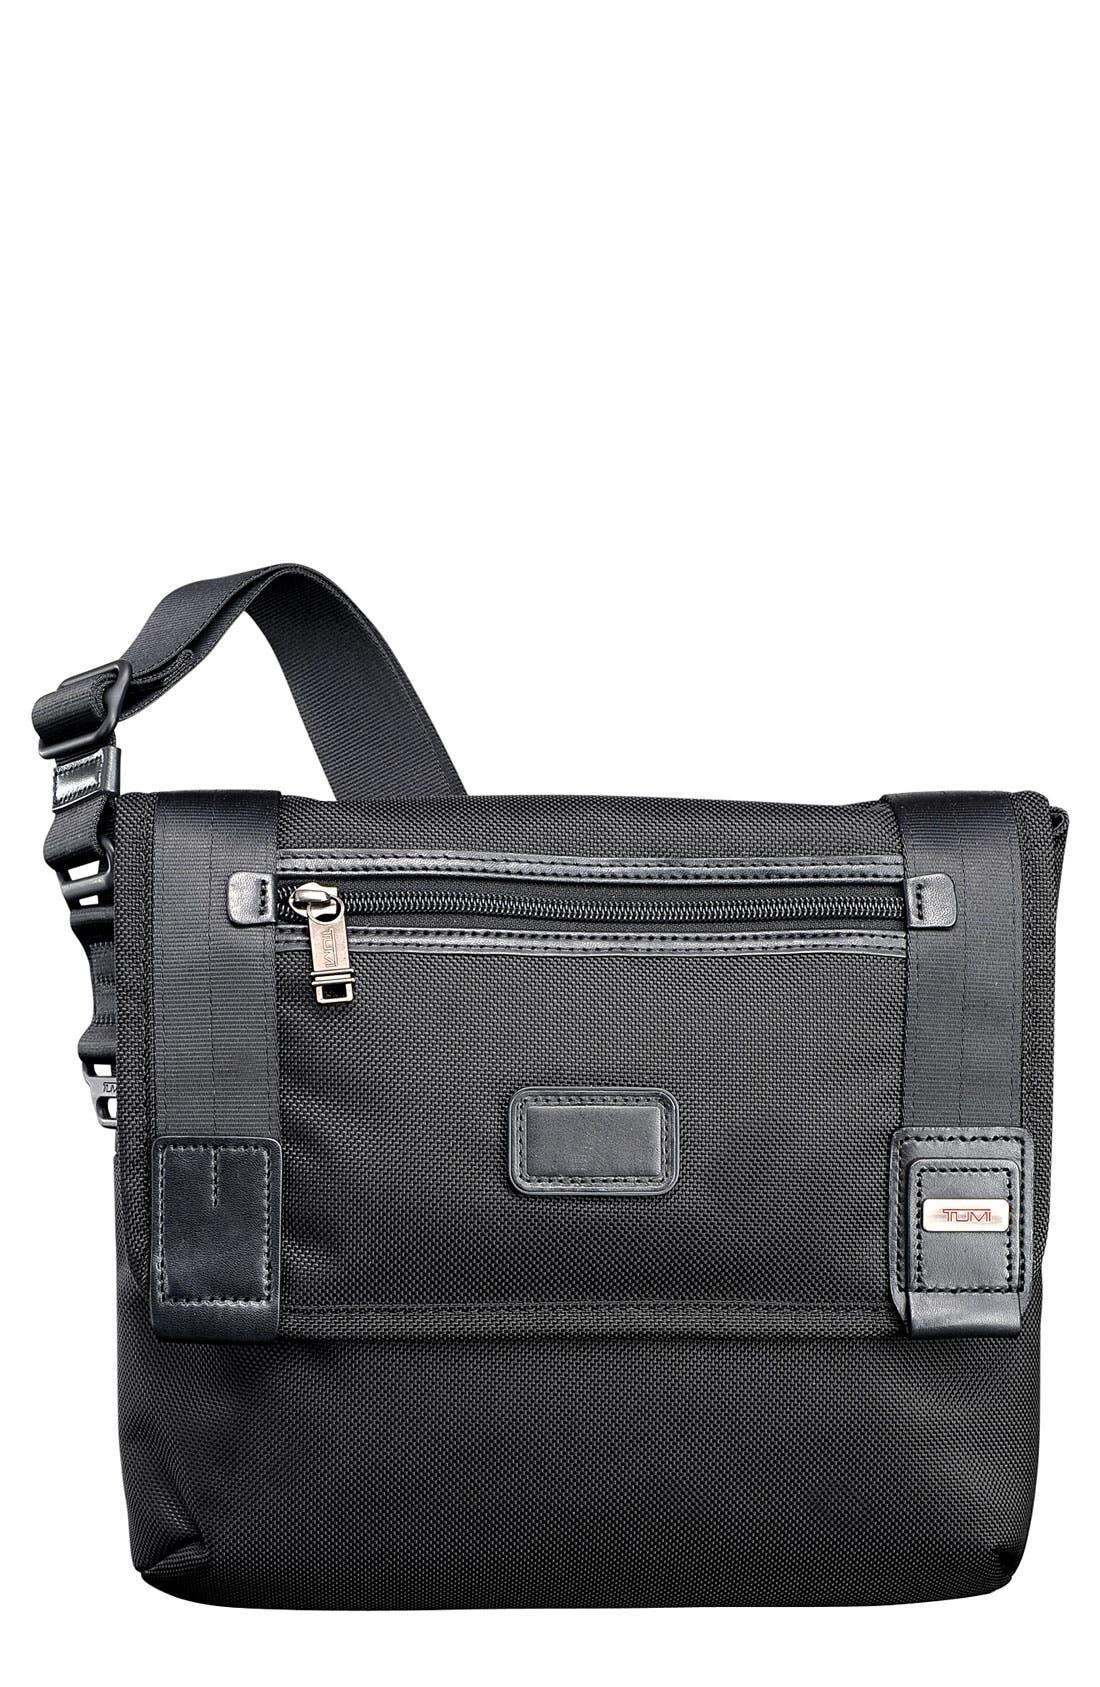 Main Image - Tumi 'Alpha Bravo - Beale Mini' Messenger Bag